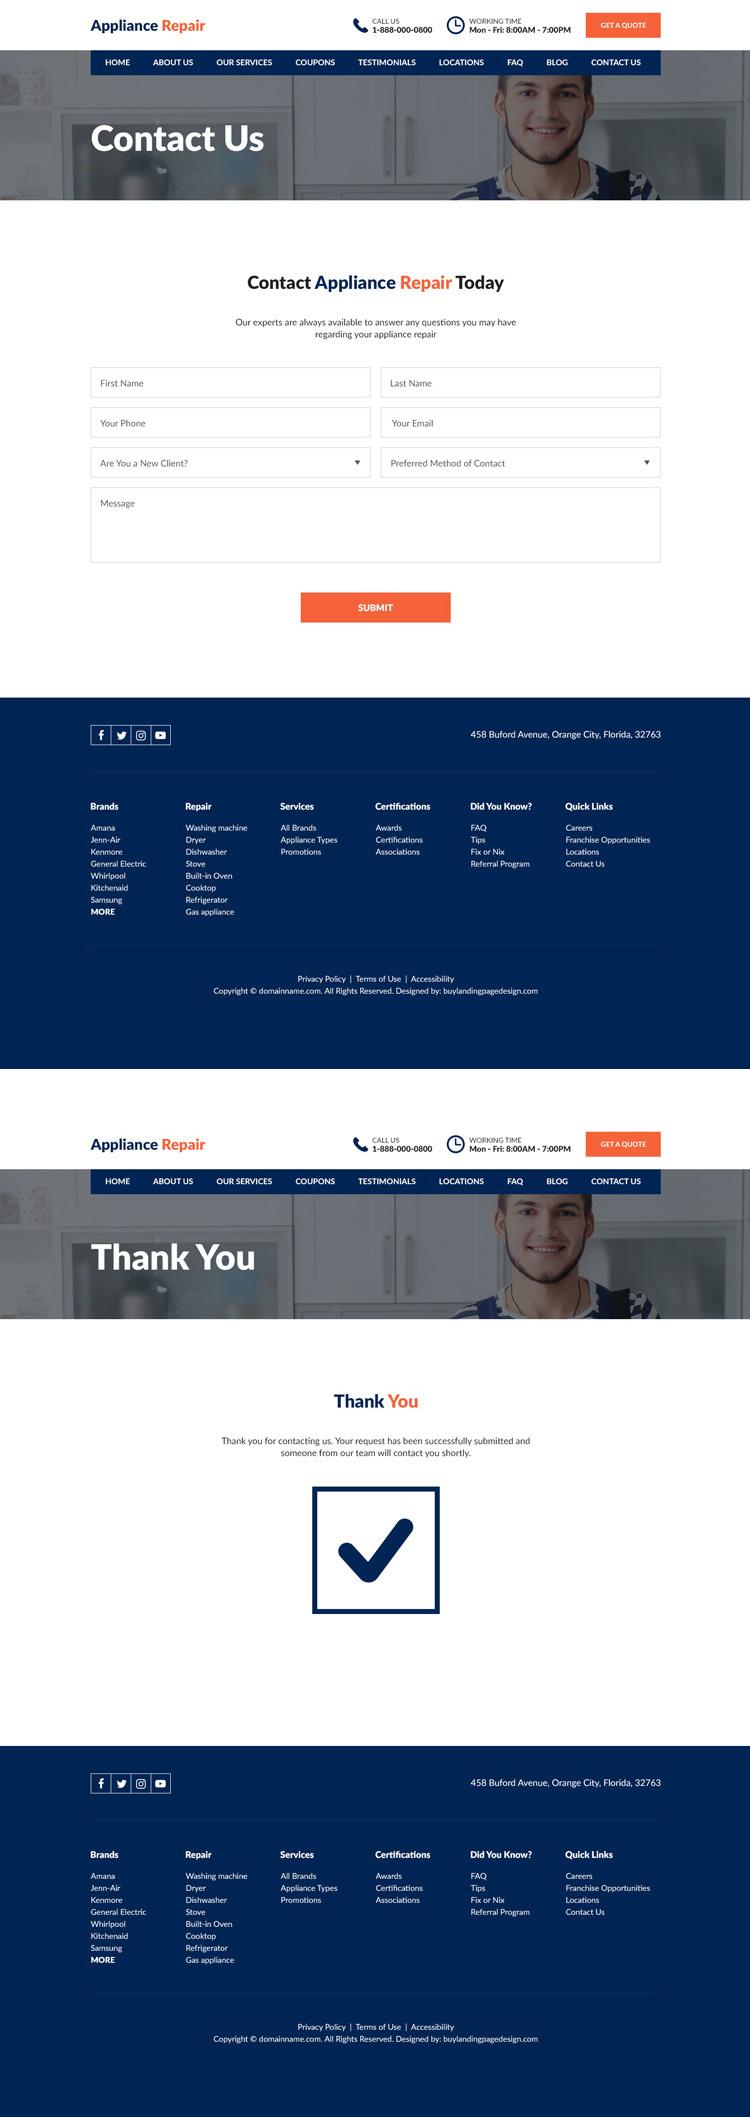 appliance repair service experts responsive website design